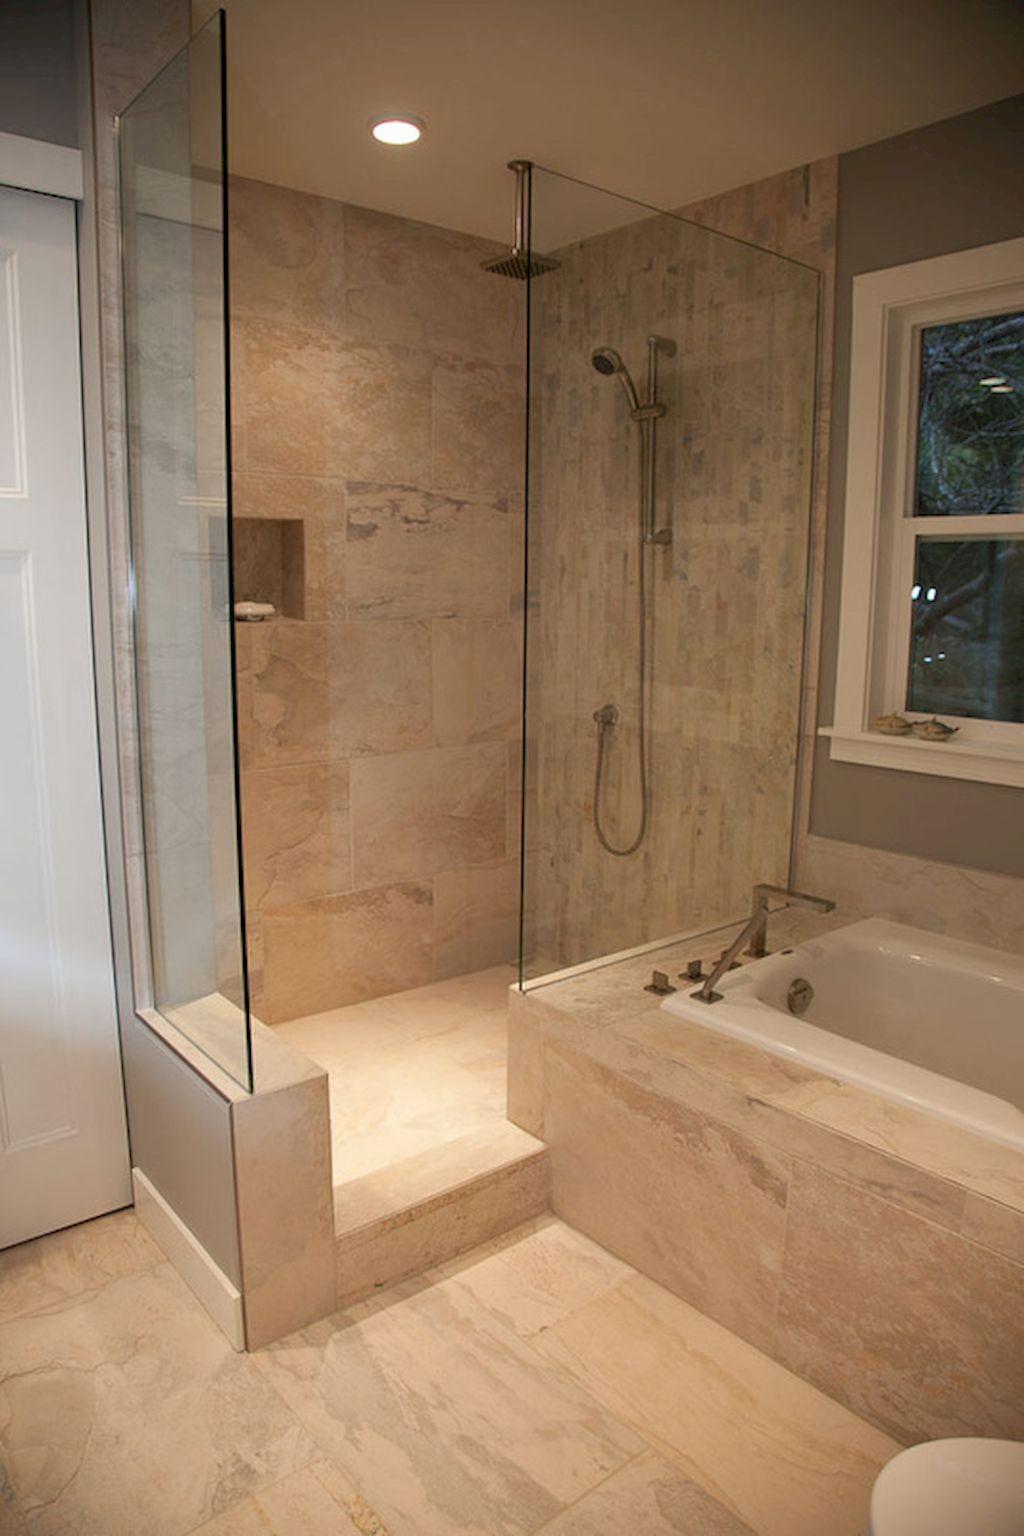 Tile Decor And More 85 Beautiful Bathroom Shower Tile Decor Ideas  Bathtubs Master